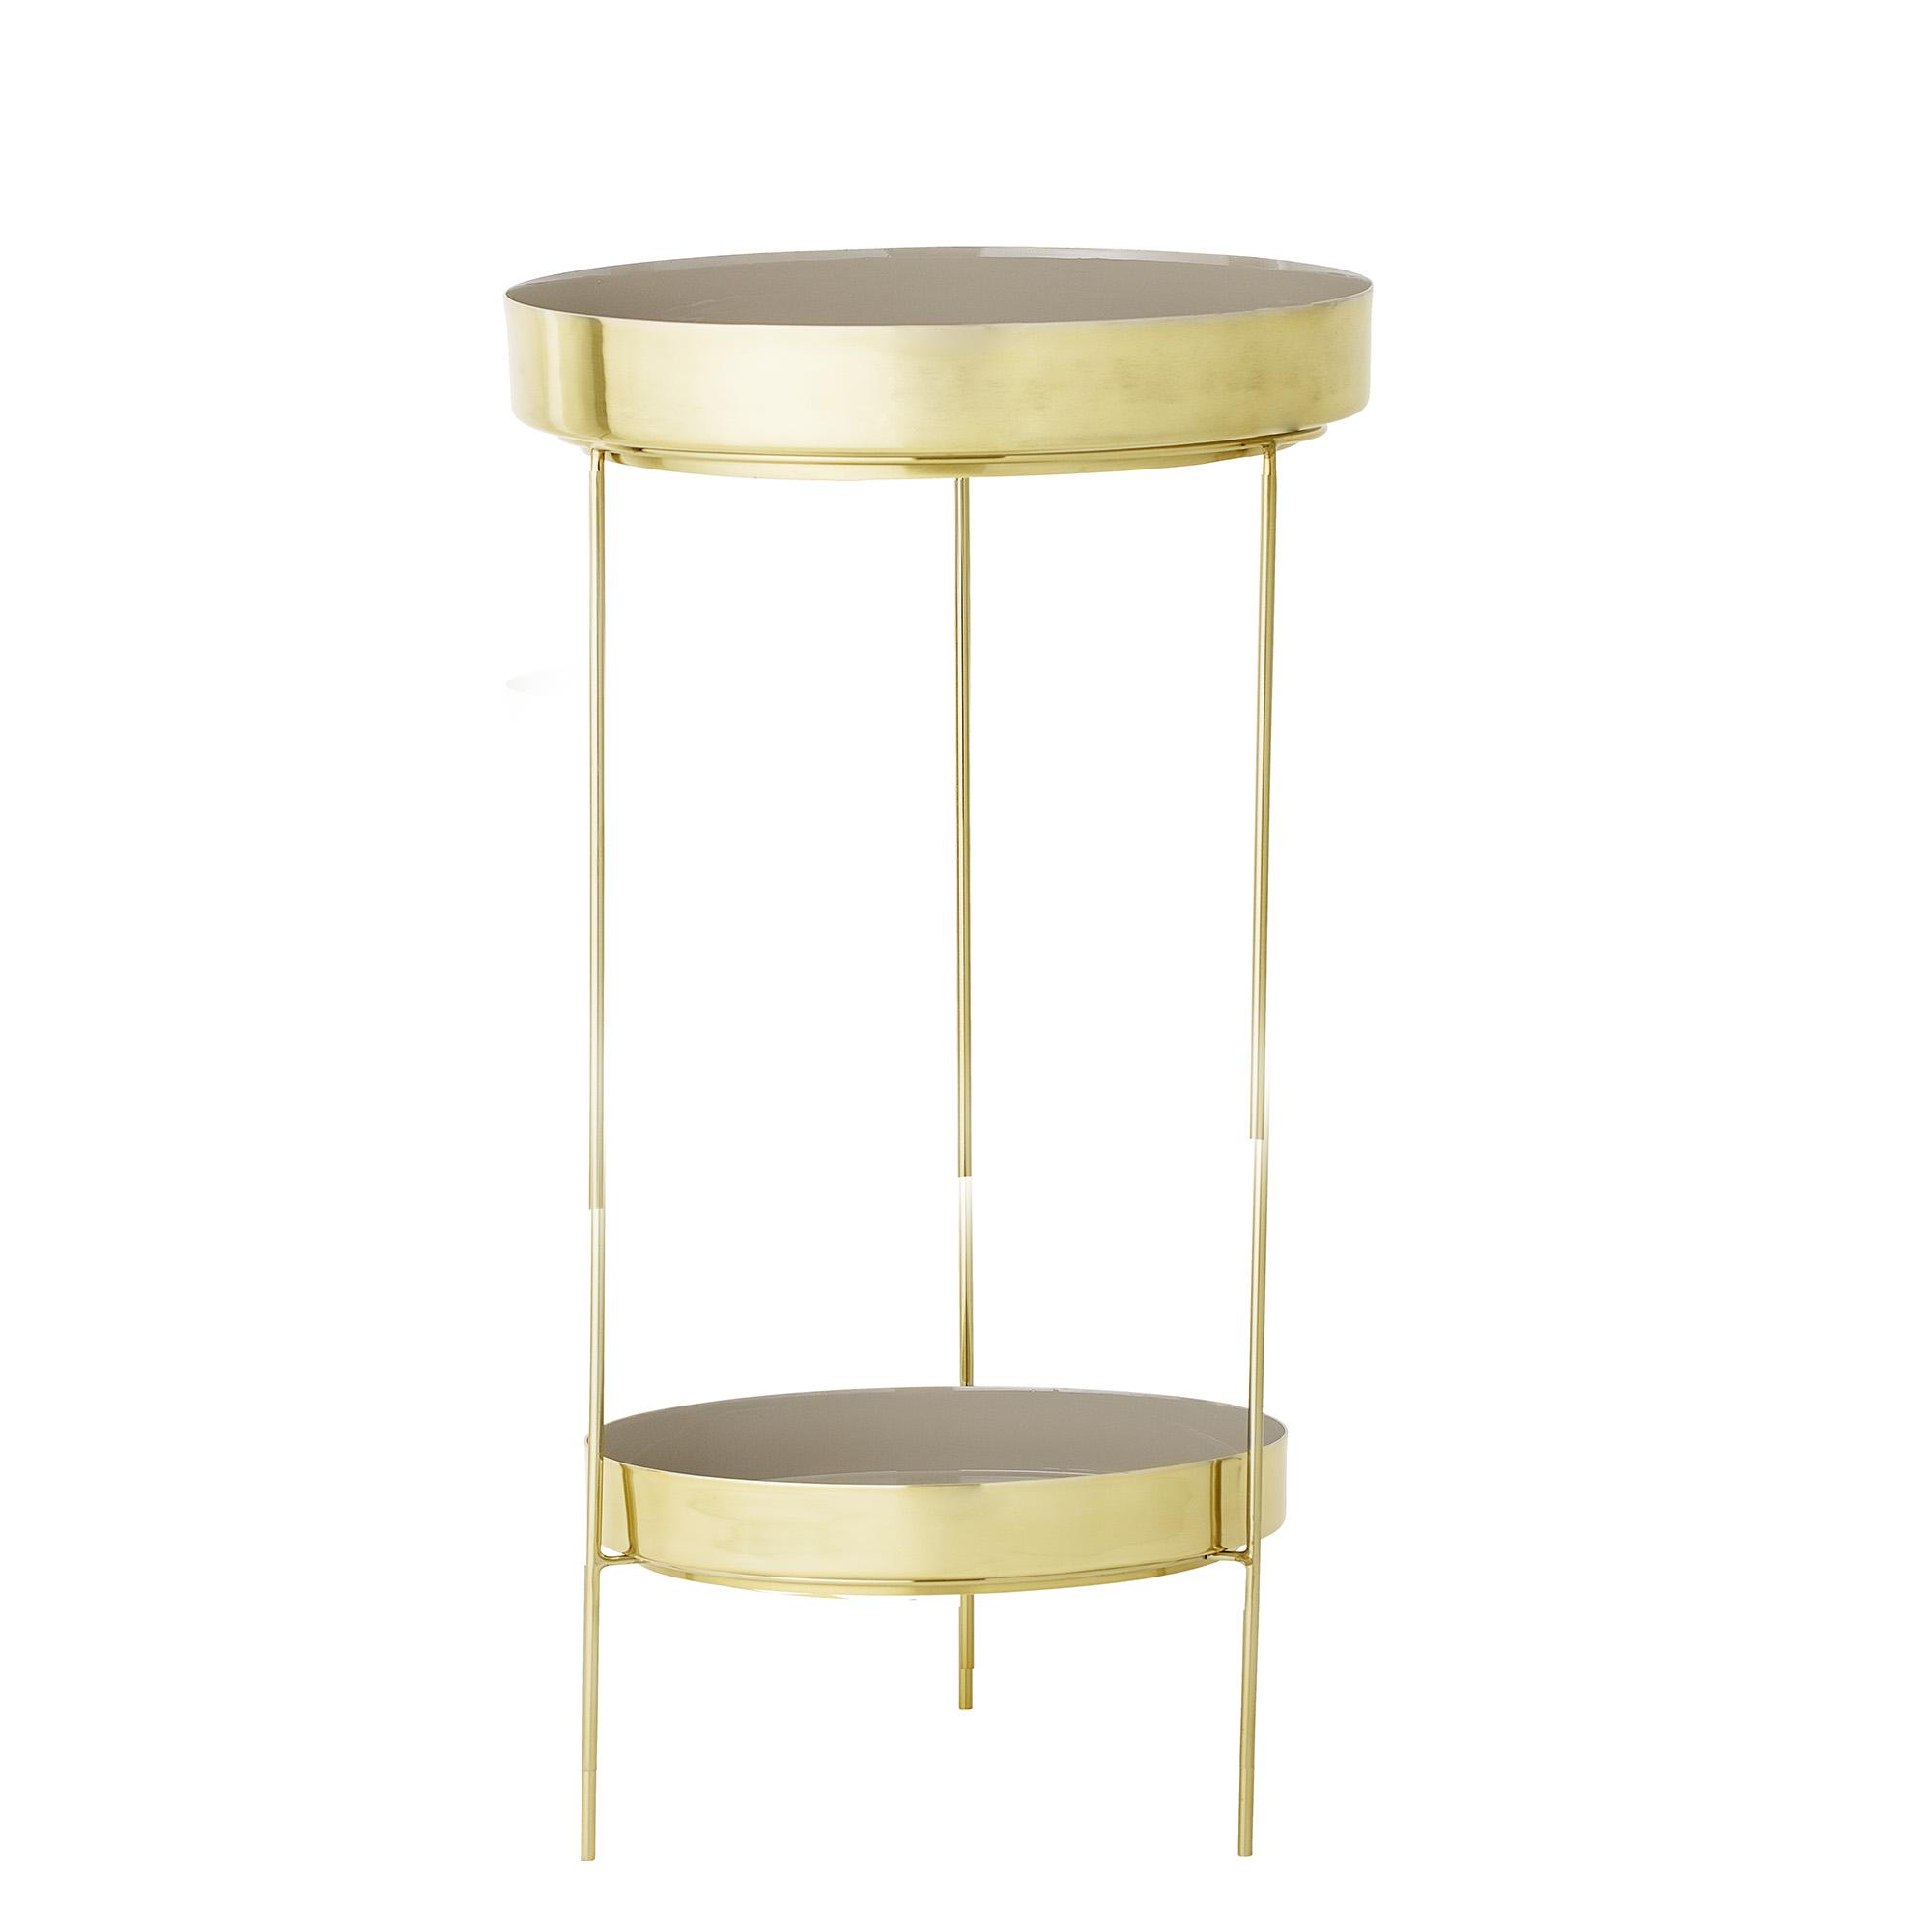 bloomingville – Bloomingville dos bakkebord - beige/guld aluminium/stål, rund, m. 2 bakker (ø43) fra boboonline.dk